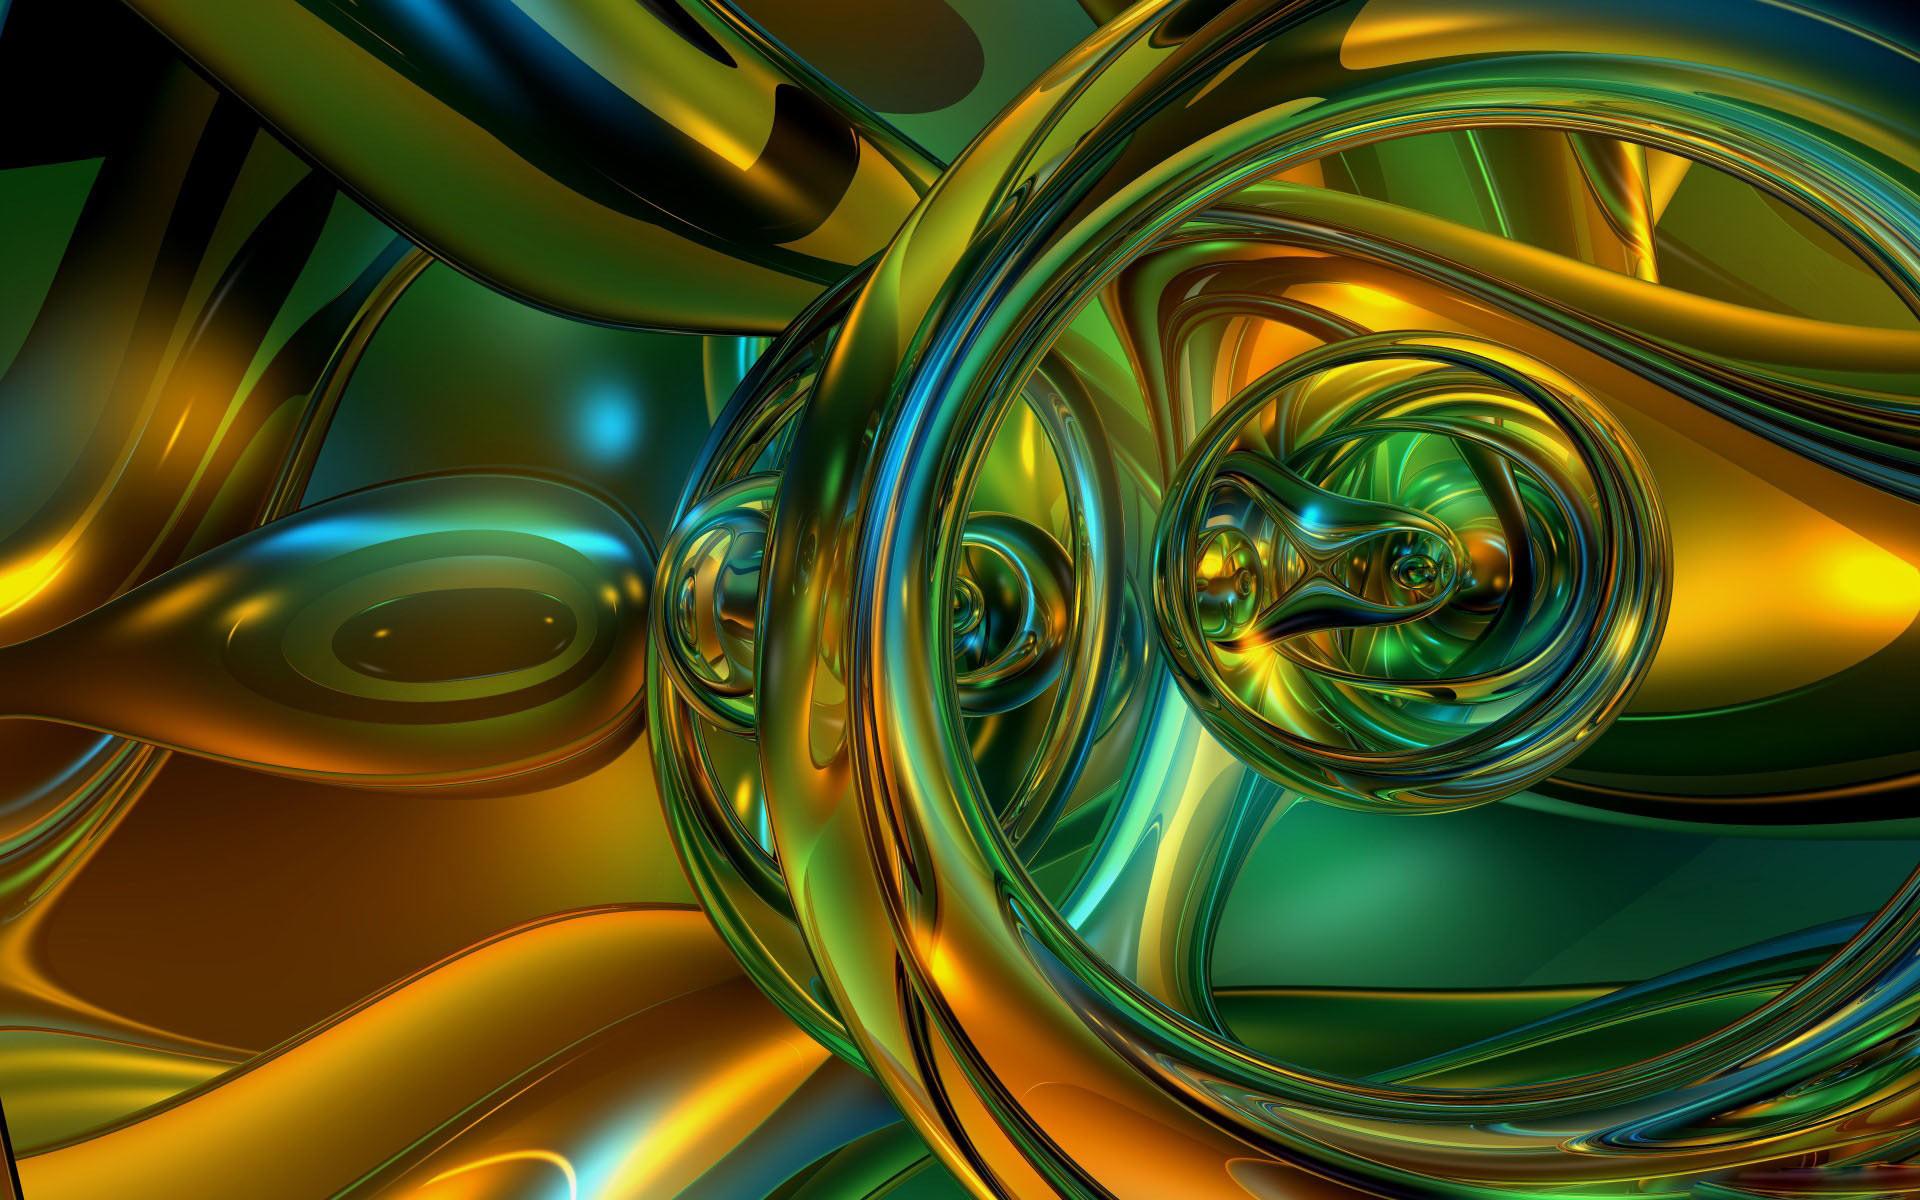 3D Desktop Backgrounds (55+ Images